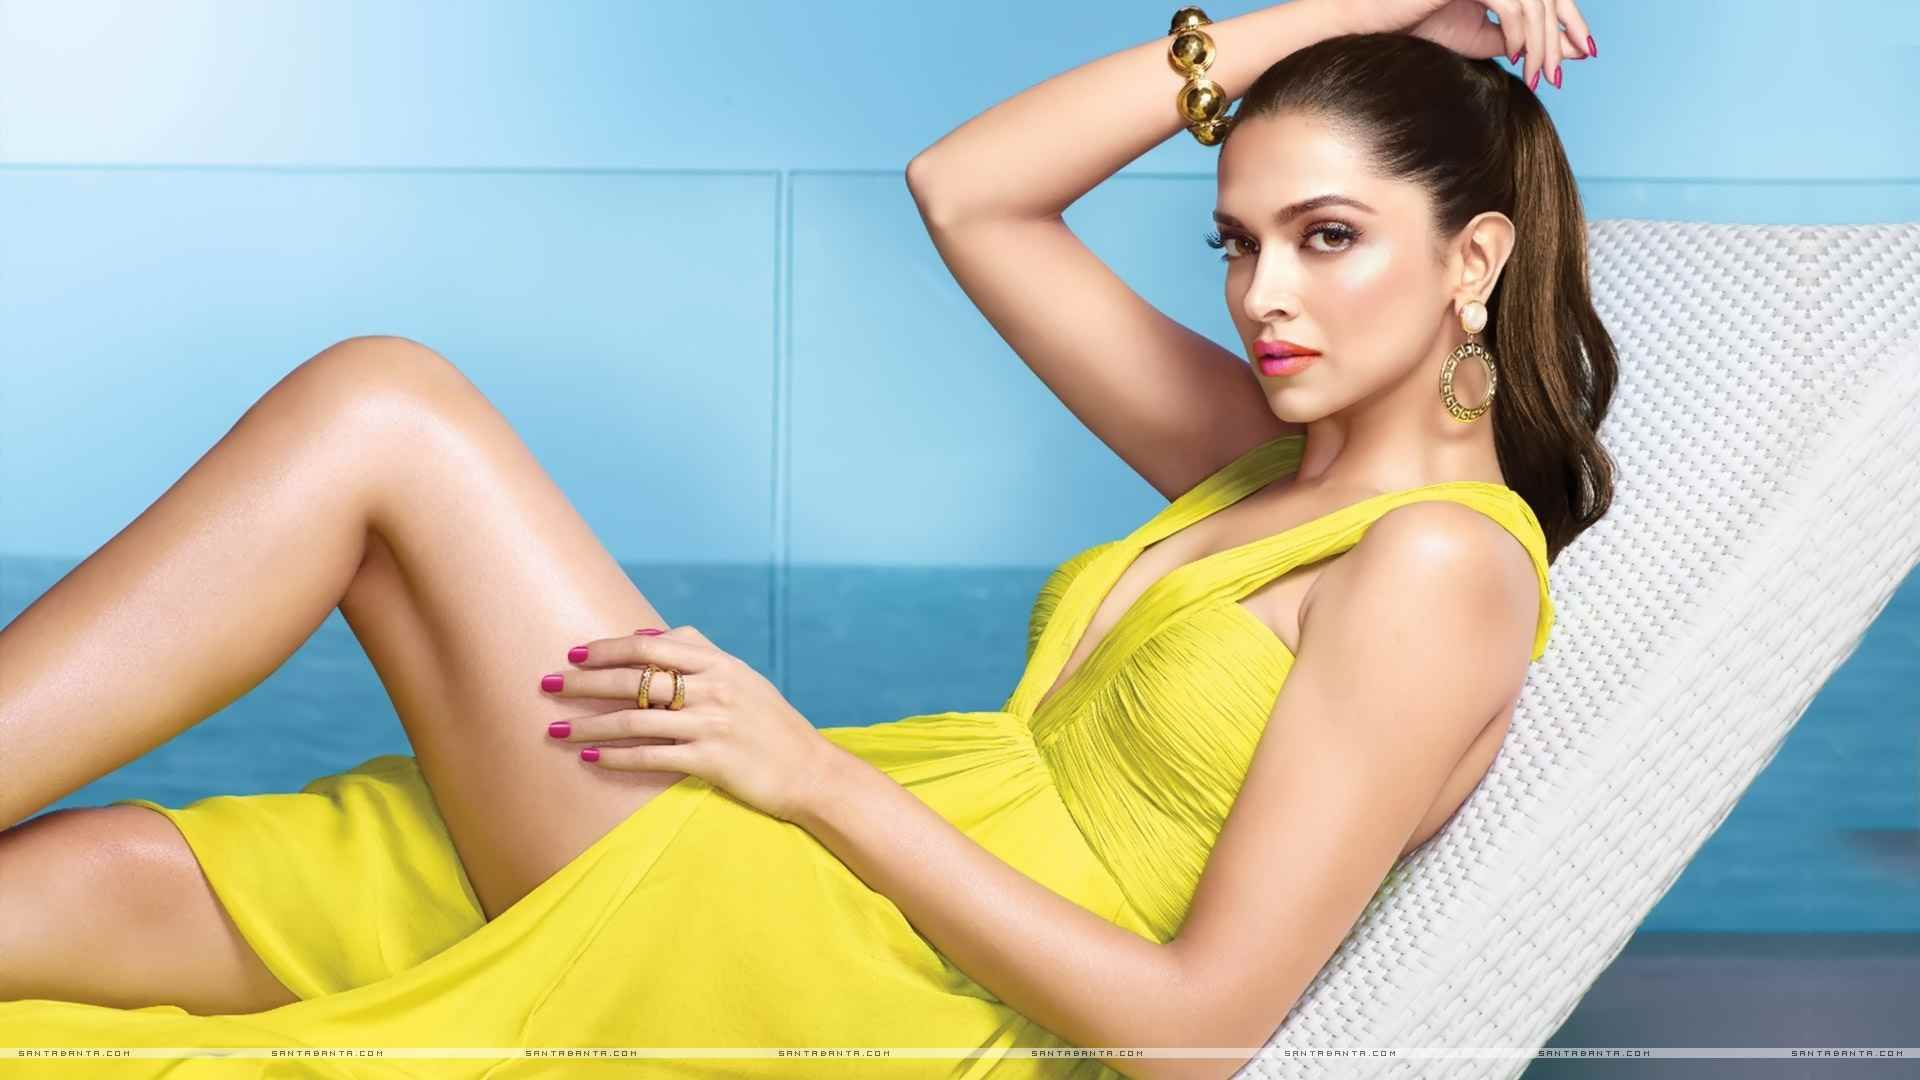 Deepika Padukone Hd Wallpapers 10 Most Beautiful Women Yellow Dress Brunette Celebrities Deepika padukone hd wallpaper for pc